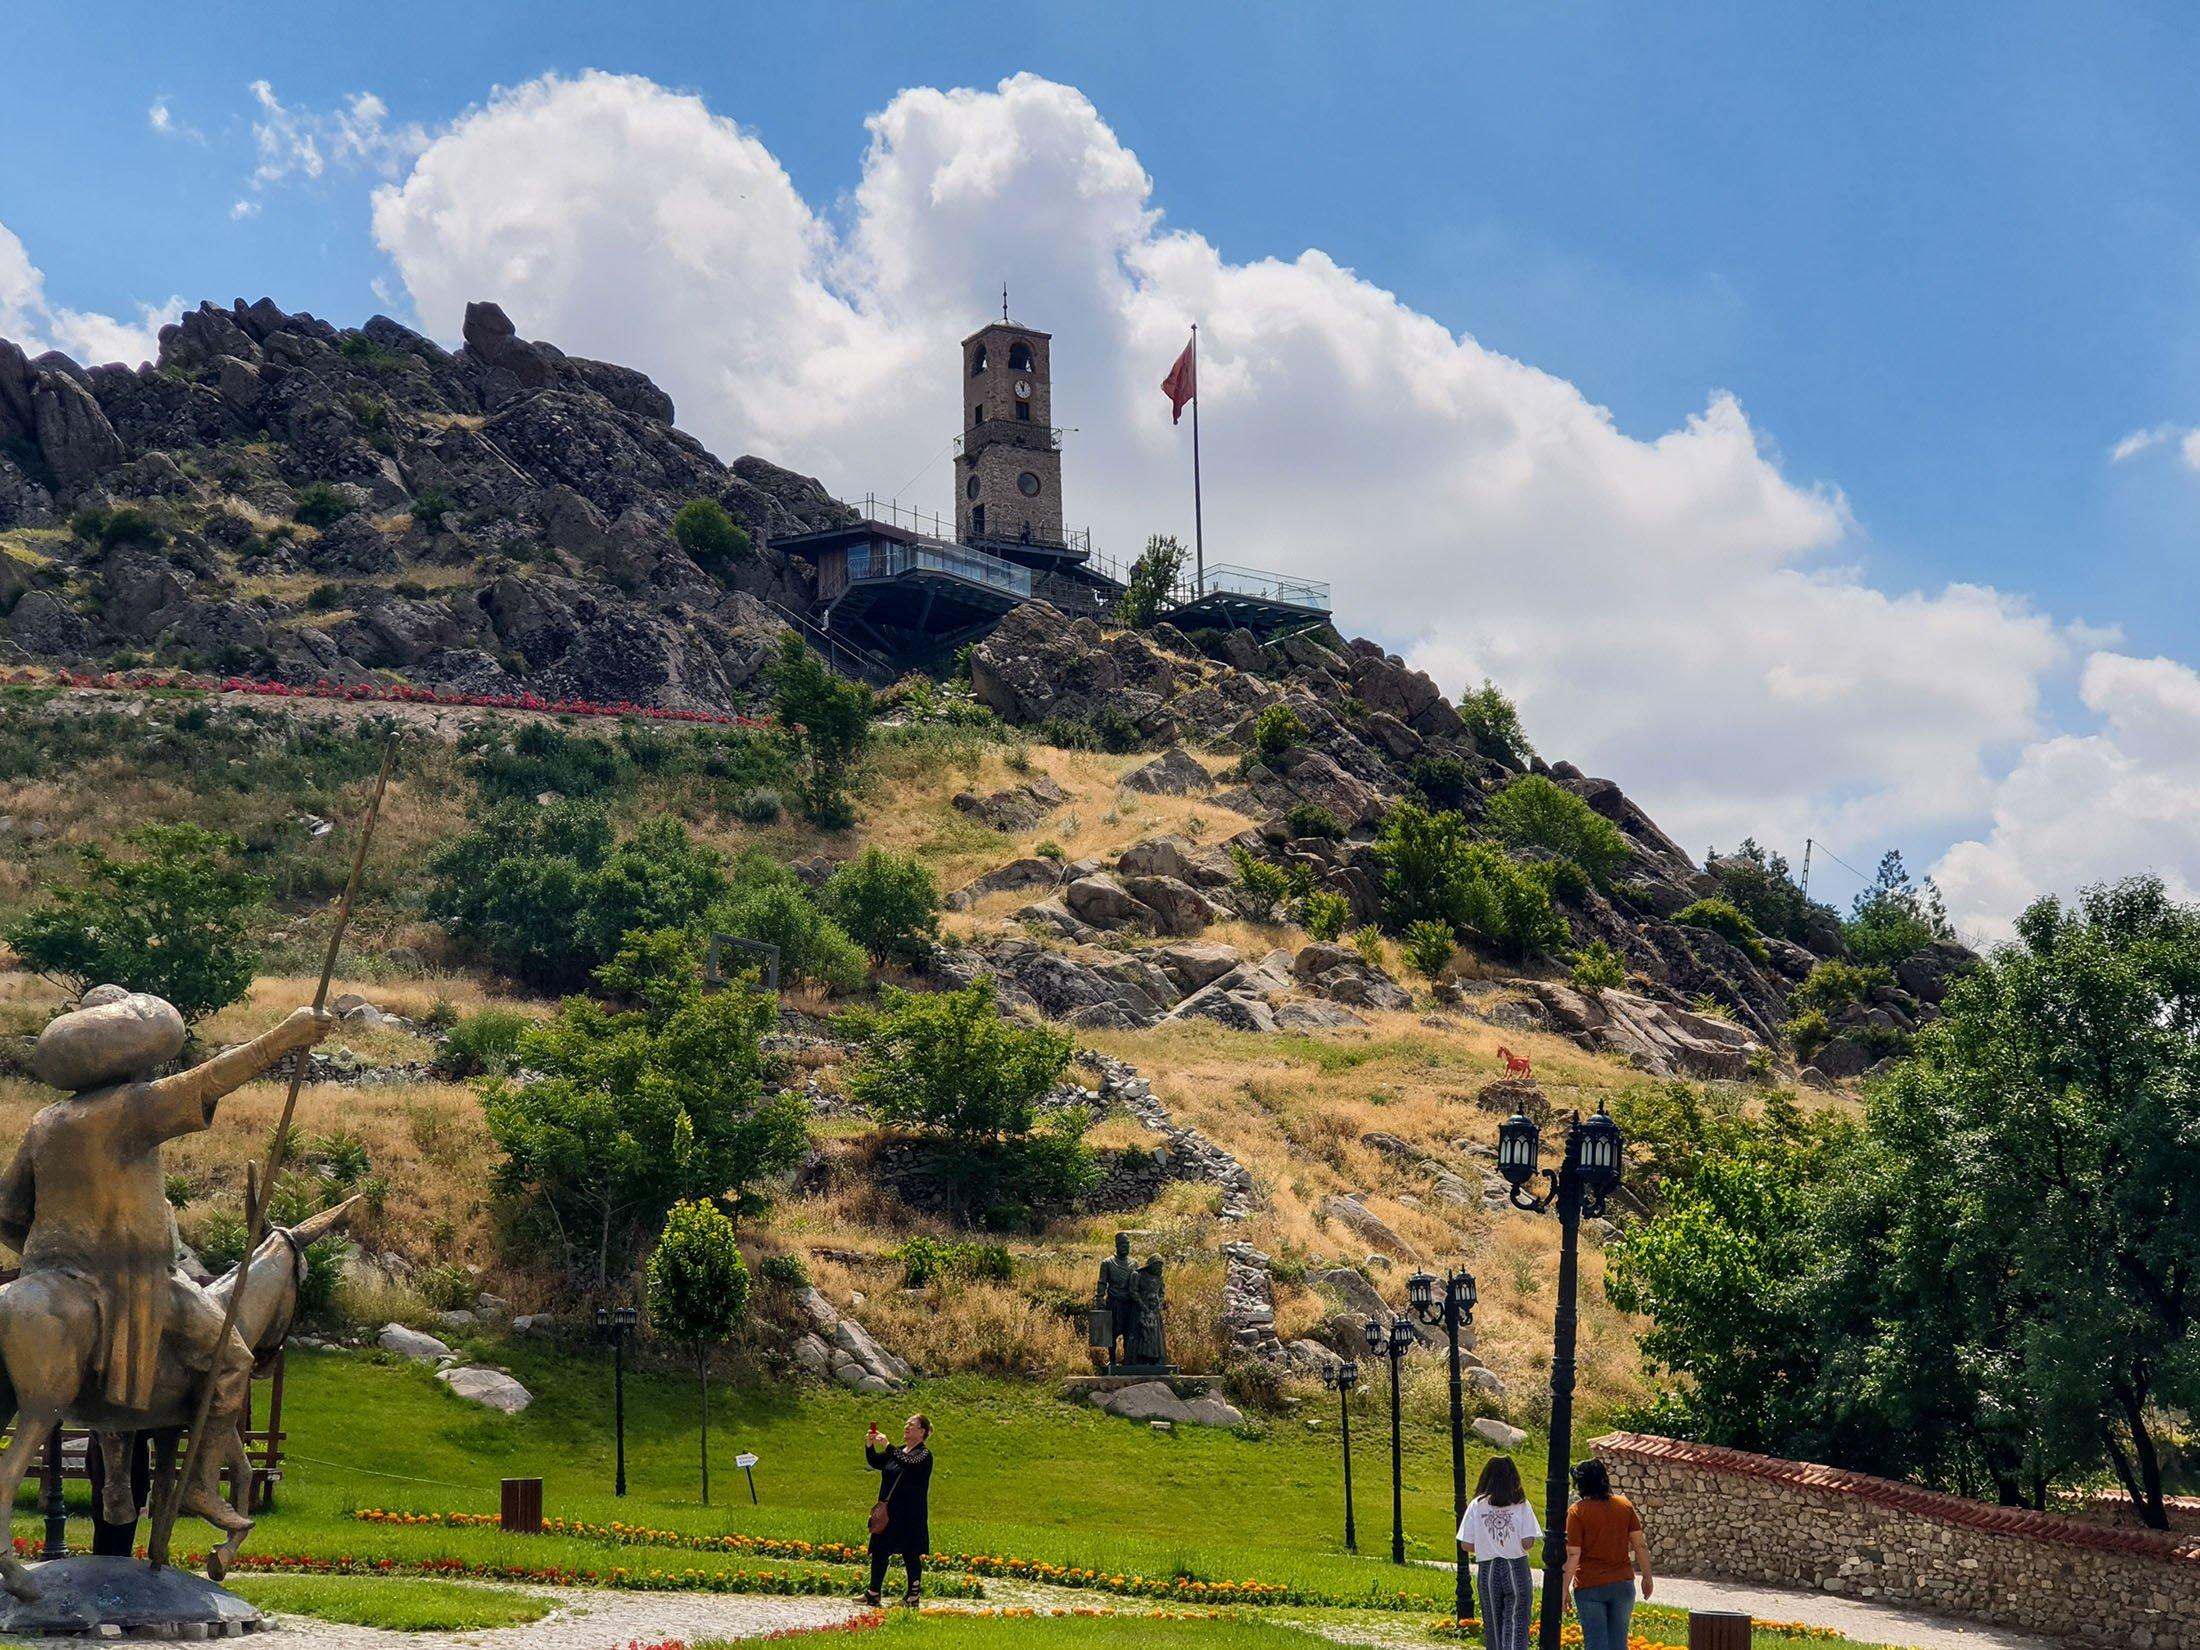 The Sivrihisar Clock Tower, Sivrihisar, Eskişehir, central Turkey.  (Photo by Argun Konuk)